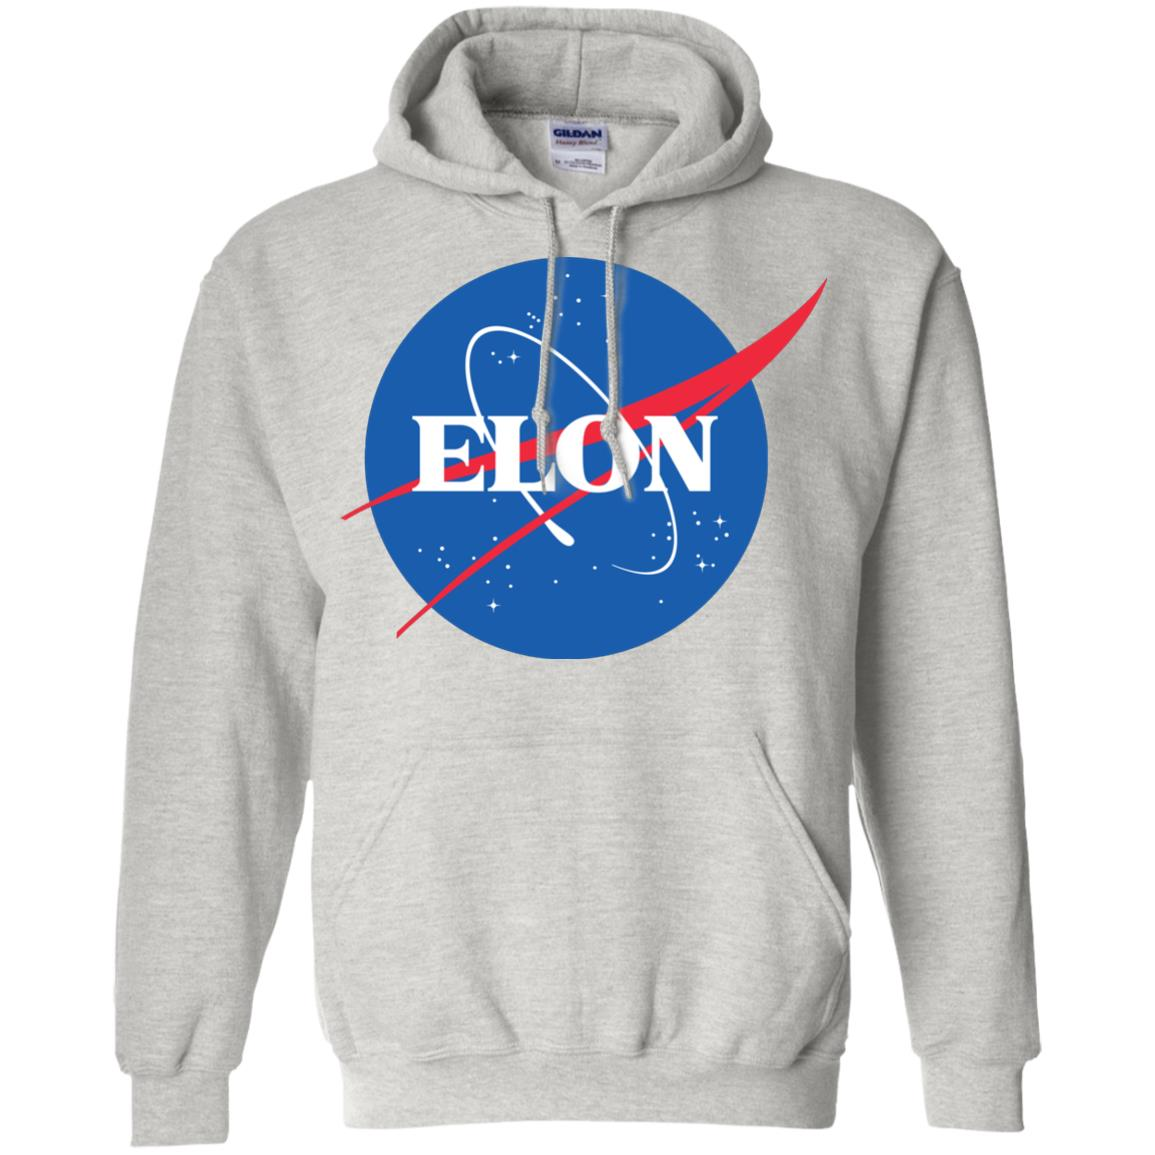 image 287px Elon Nasa parody t shirt, hoodies, tank top